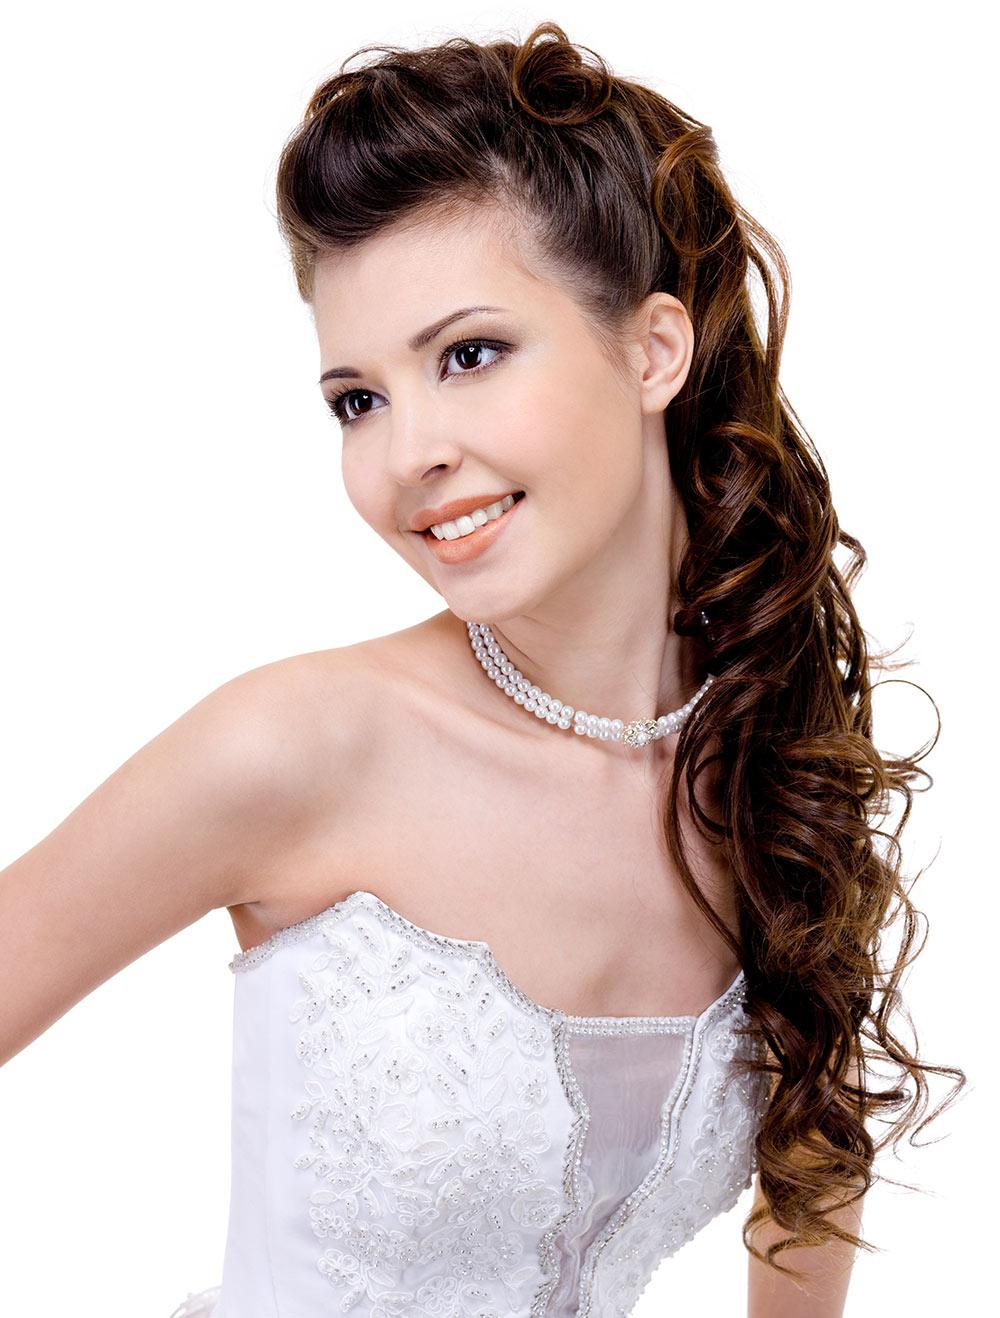 prom hair and makeup packages warrington - mugeek vidalondon